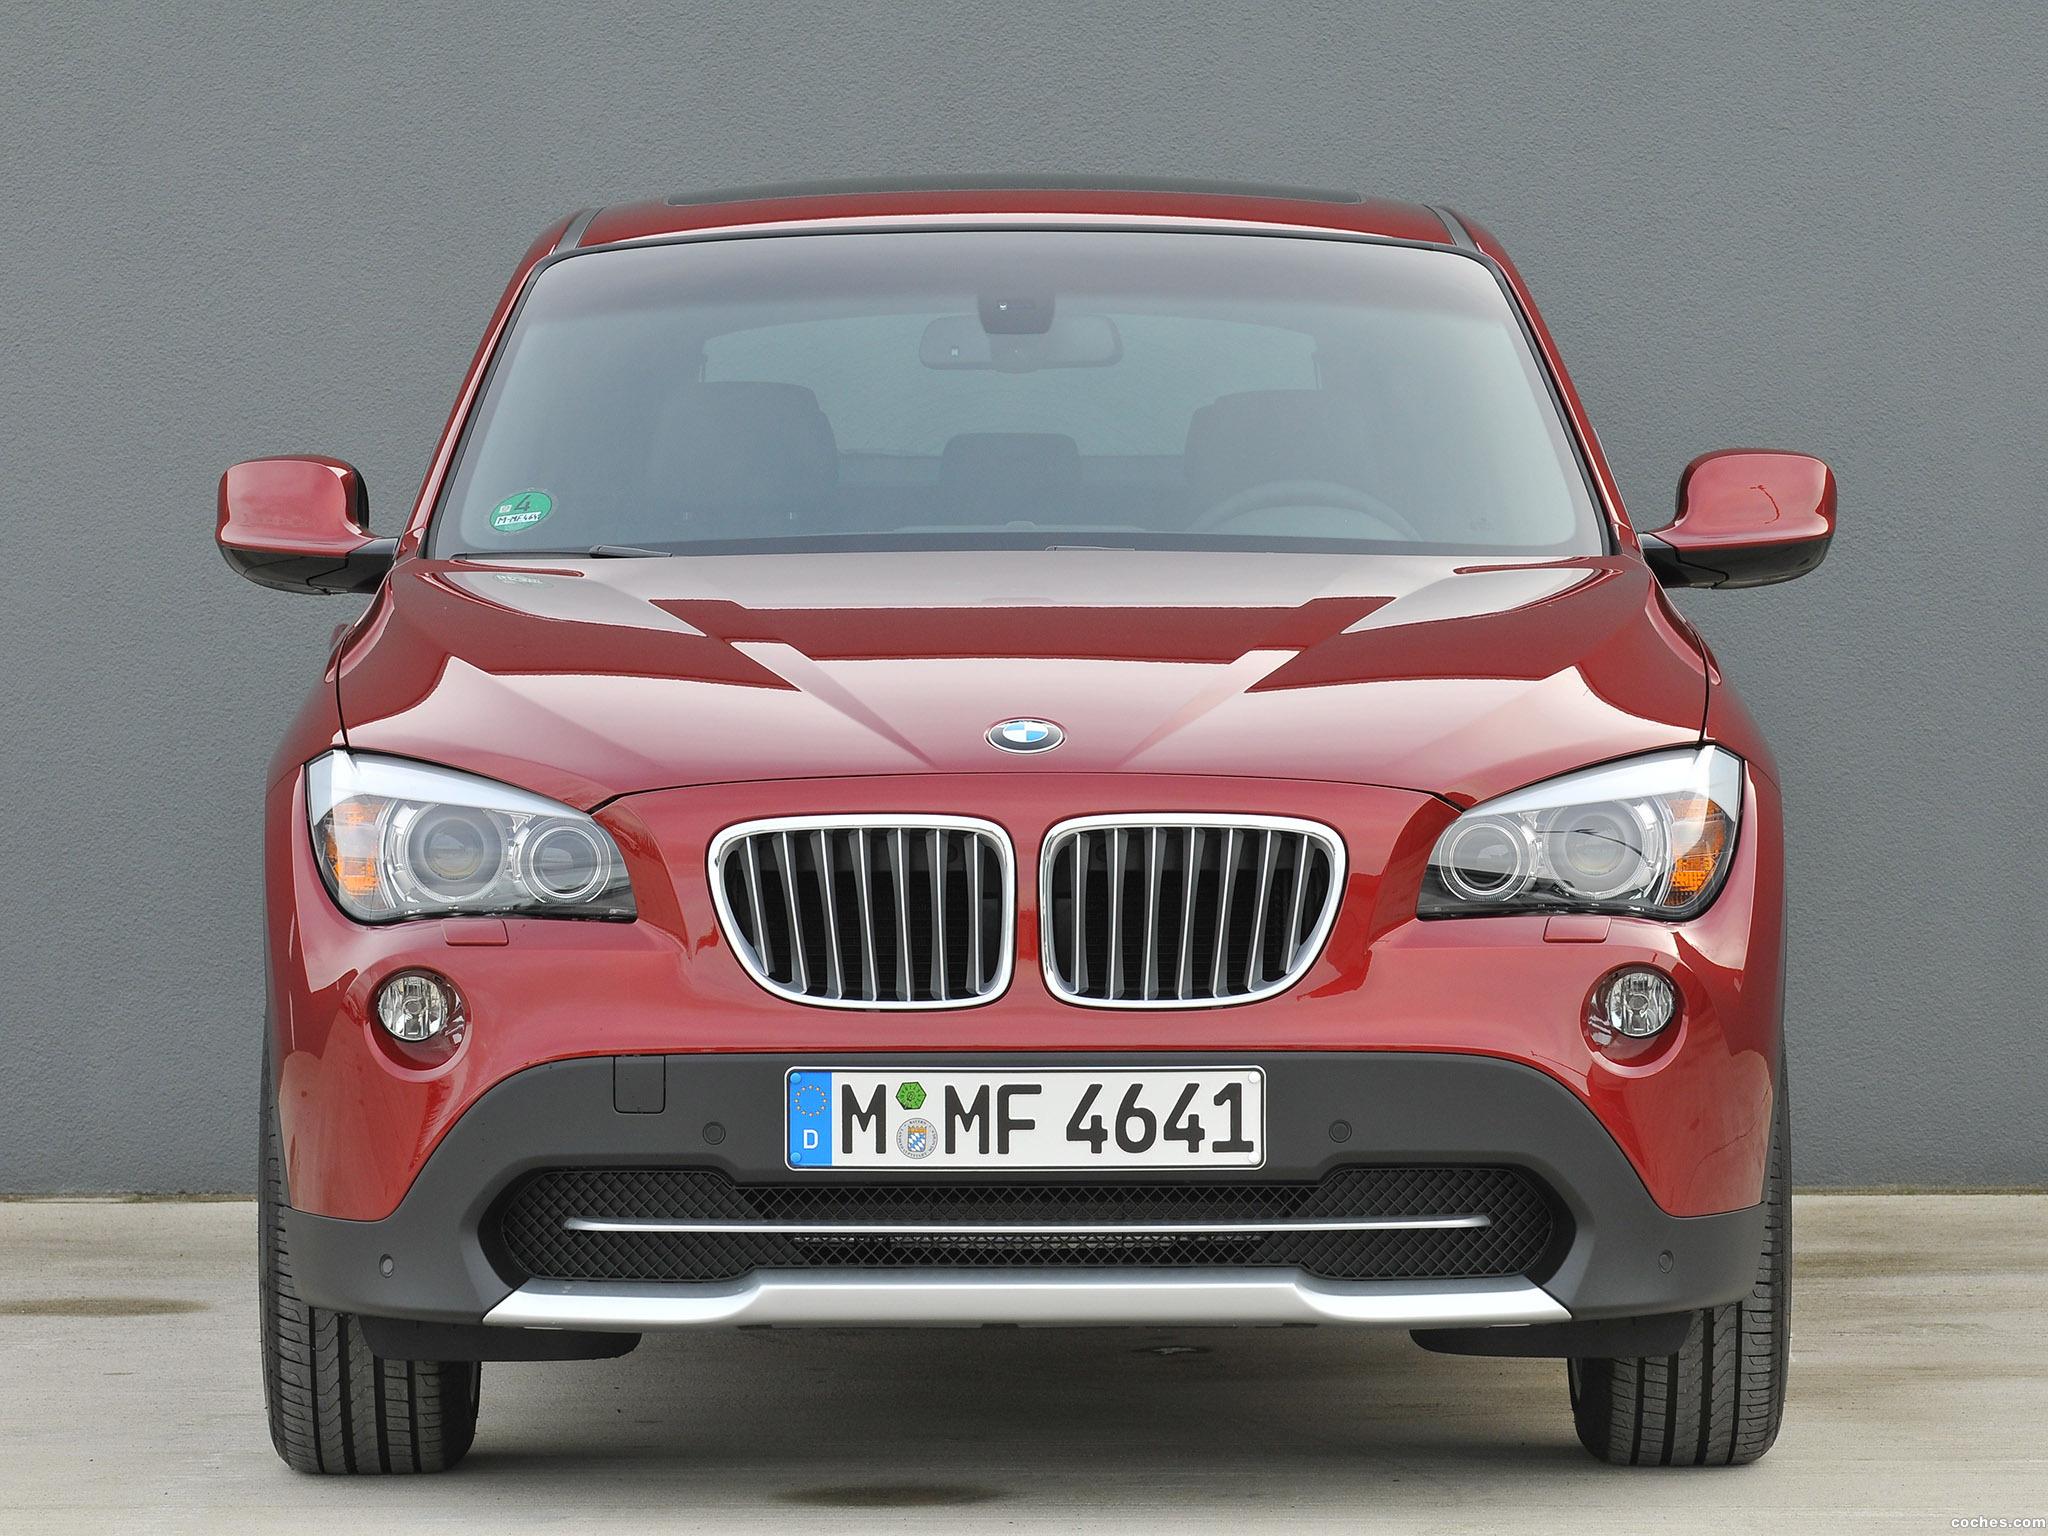 Foto 2 de BMW X1 xDrive28i 2009